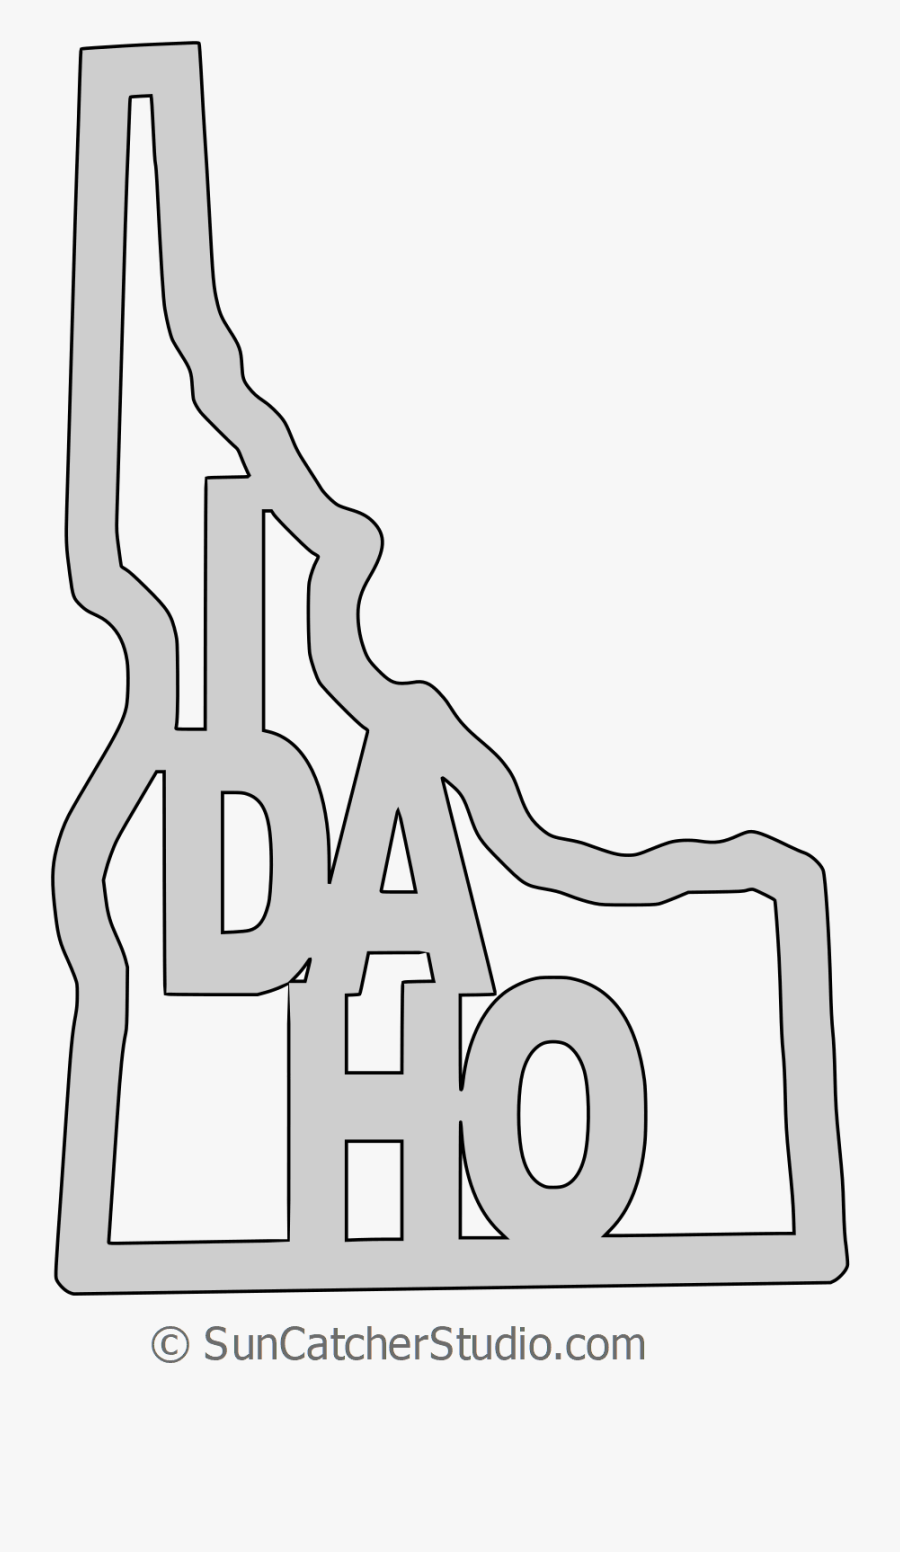 Clip Art Map Printable State Shape - Line Art, Transparent Clipart